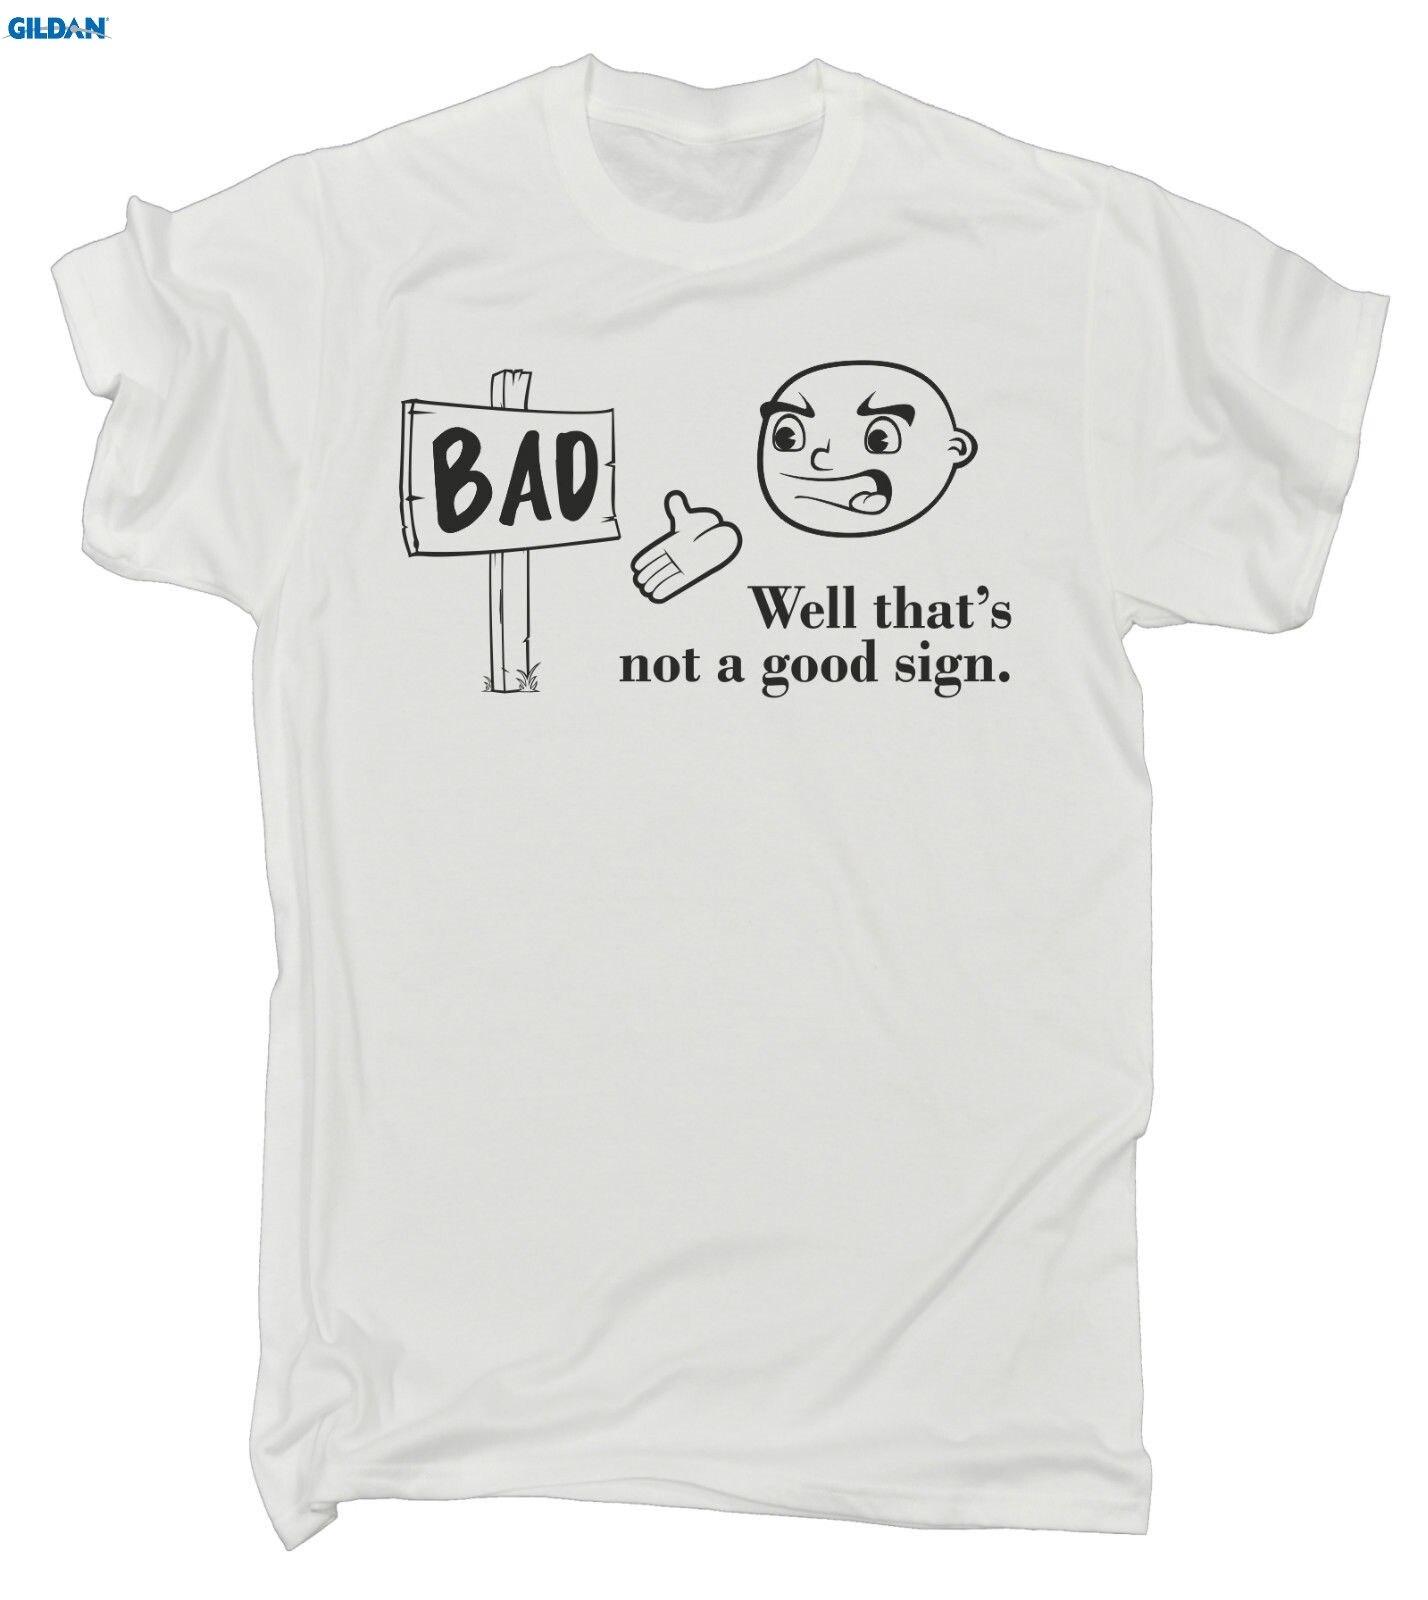 GILDAN BAD Well Thats Not A Good Sign T-SHIRT Joke Humour Funny Birthday Gift 123t Men Brand Printed 100% Cotton T Shirt